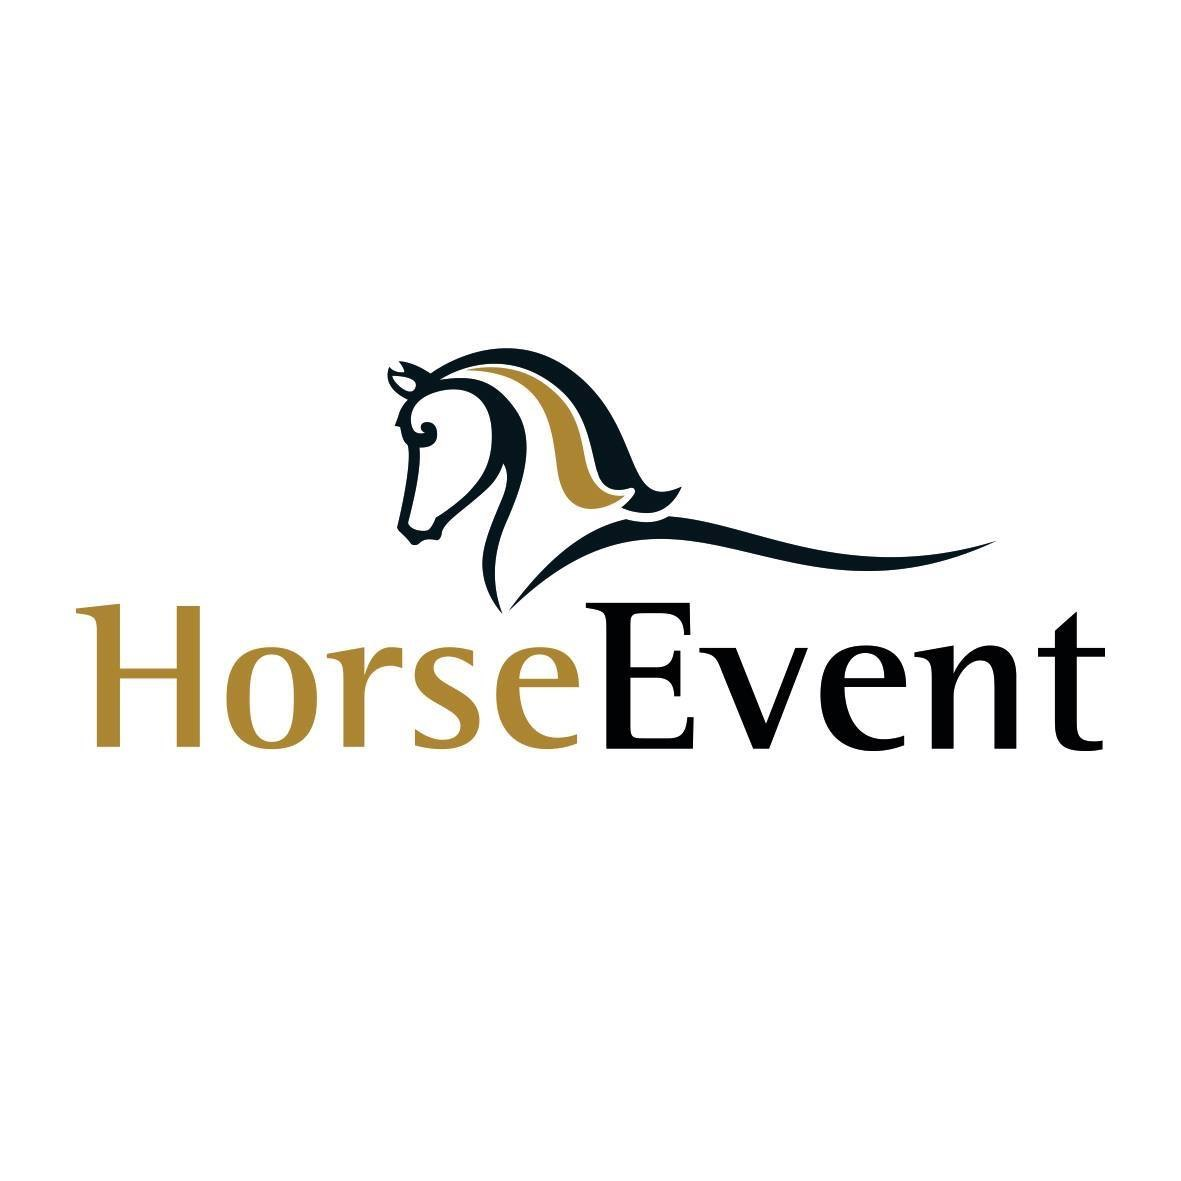 Horse Event logo